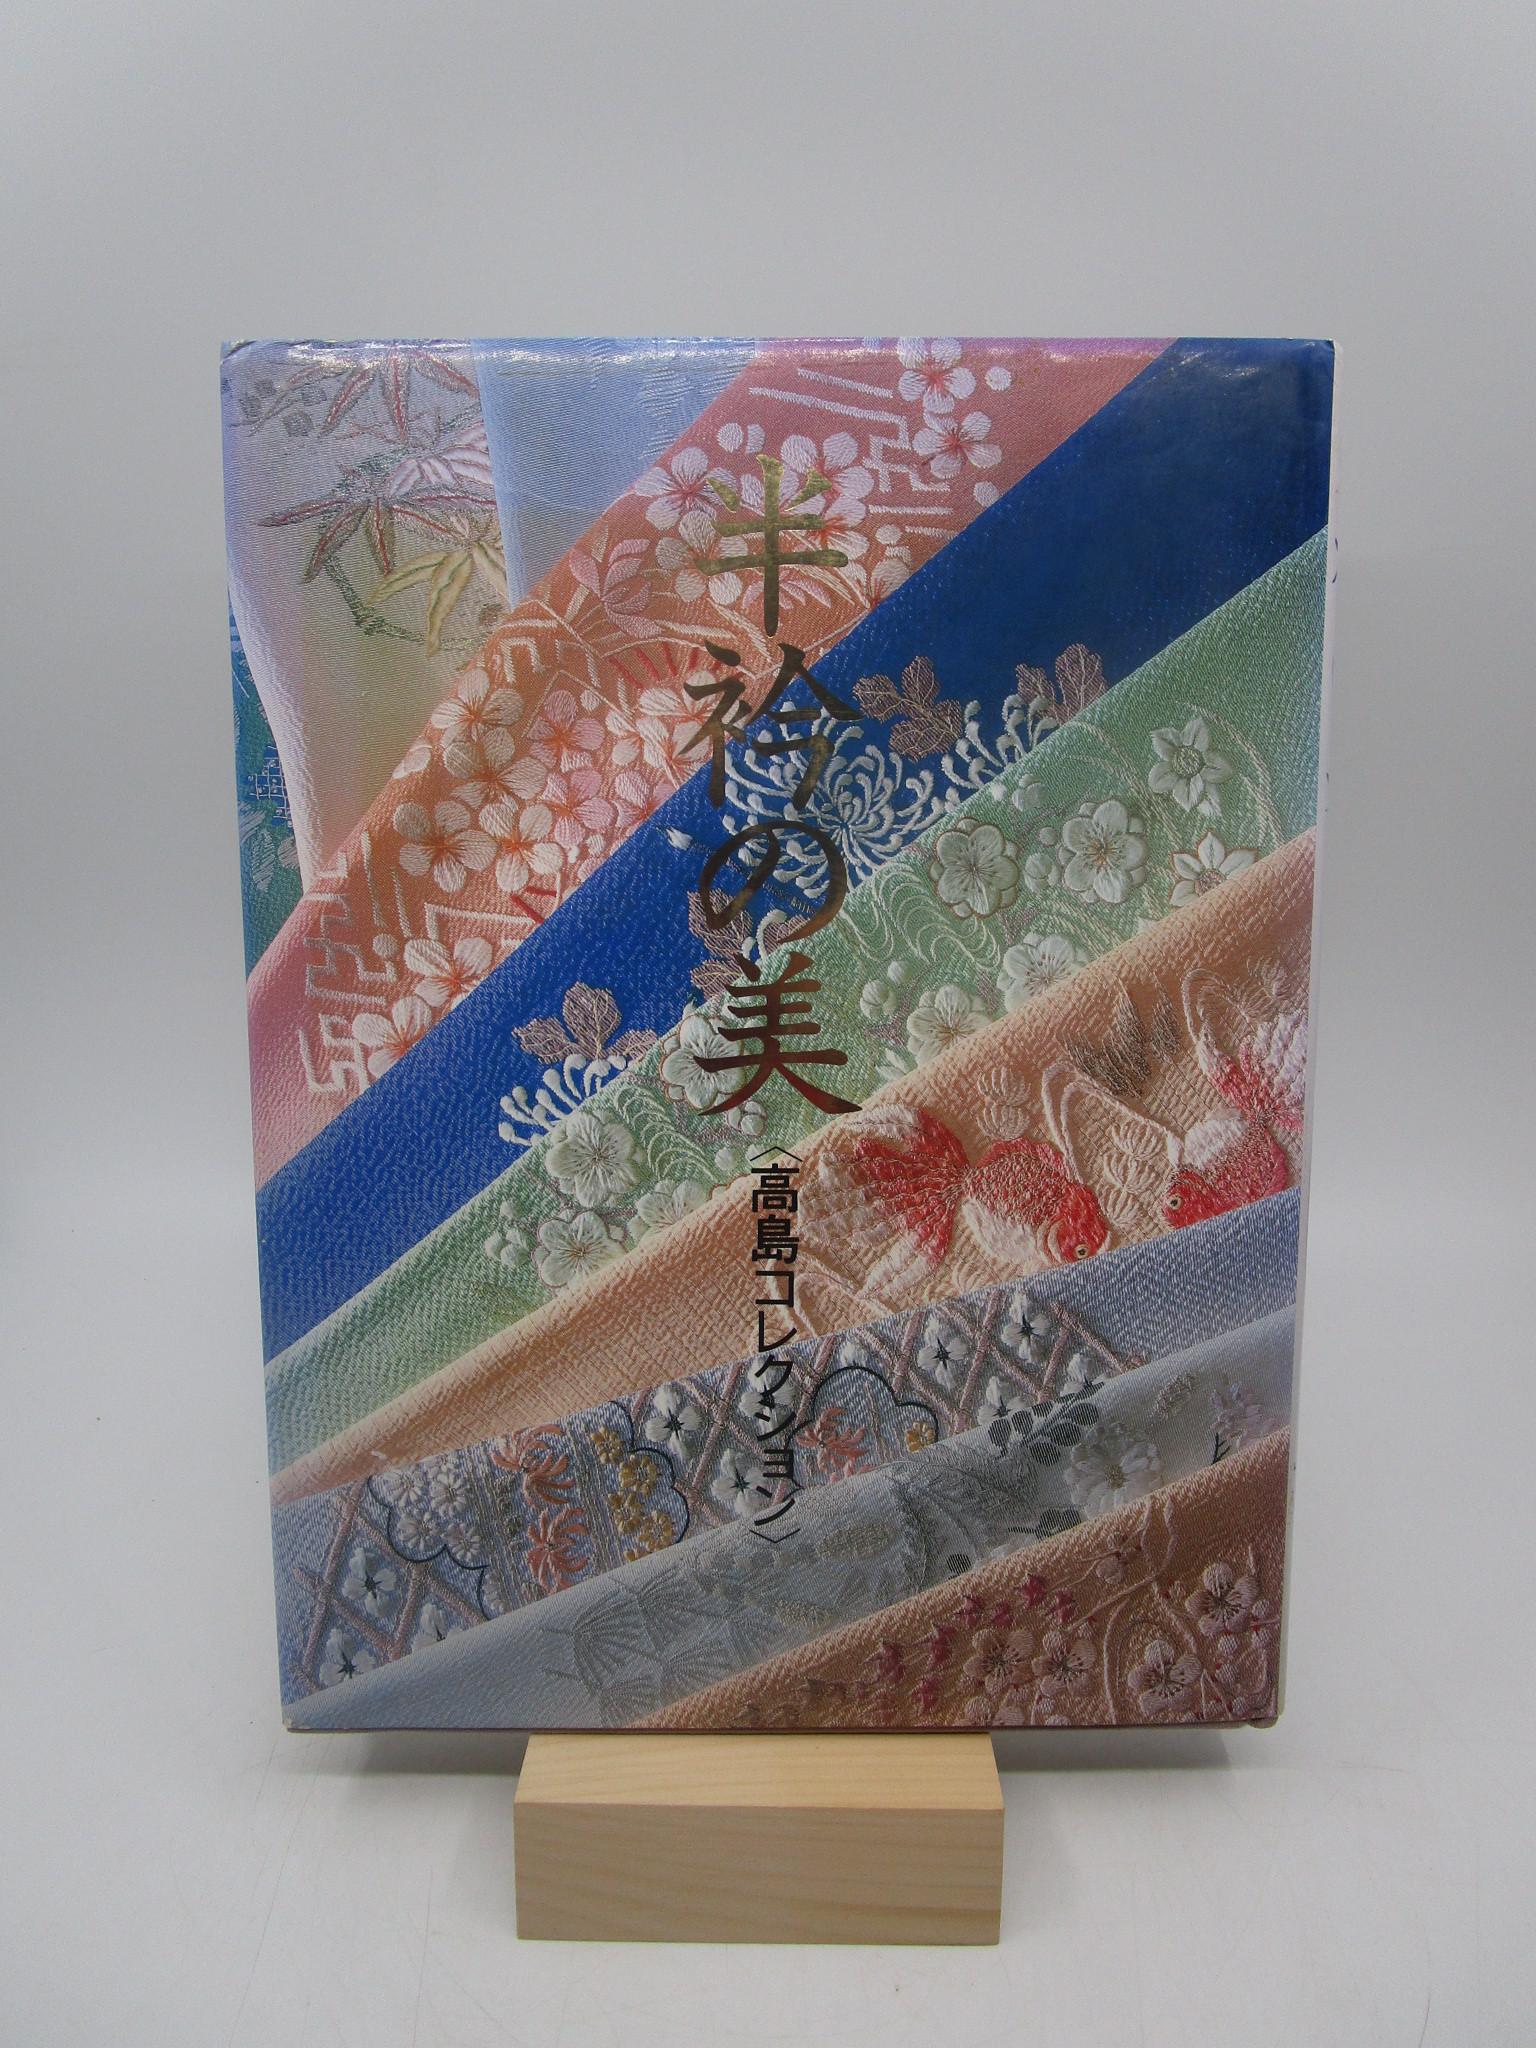 Image for Haneri no bi: Takashima korekushon (Japanese Edition)